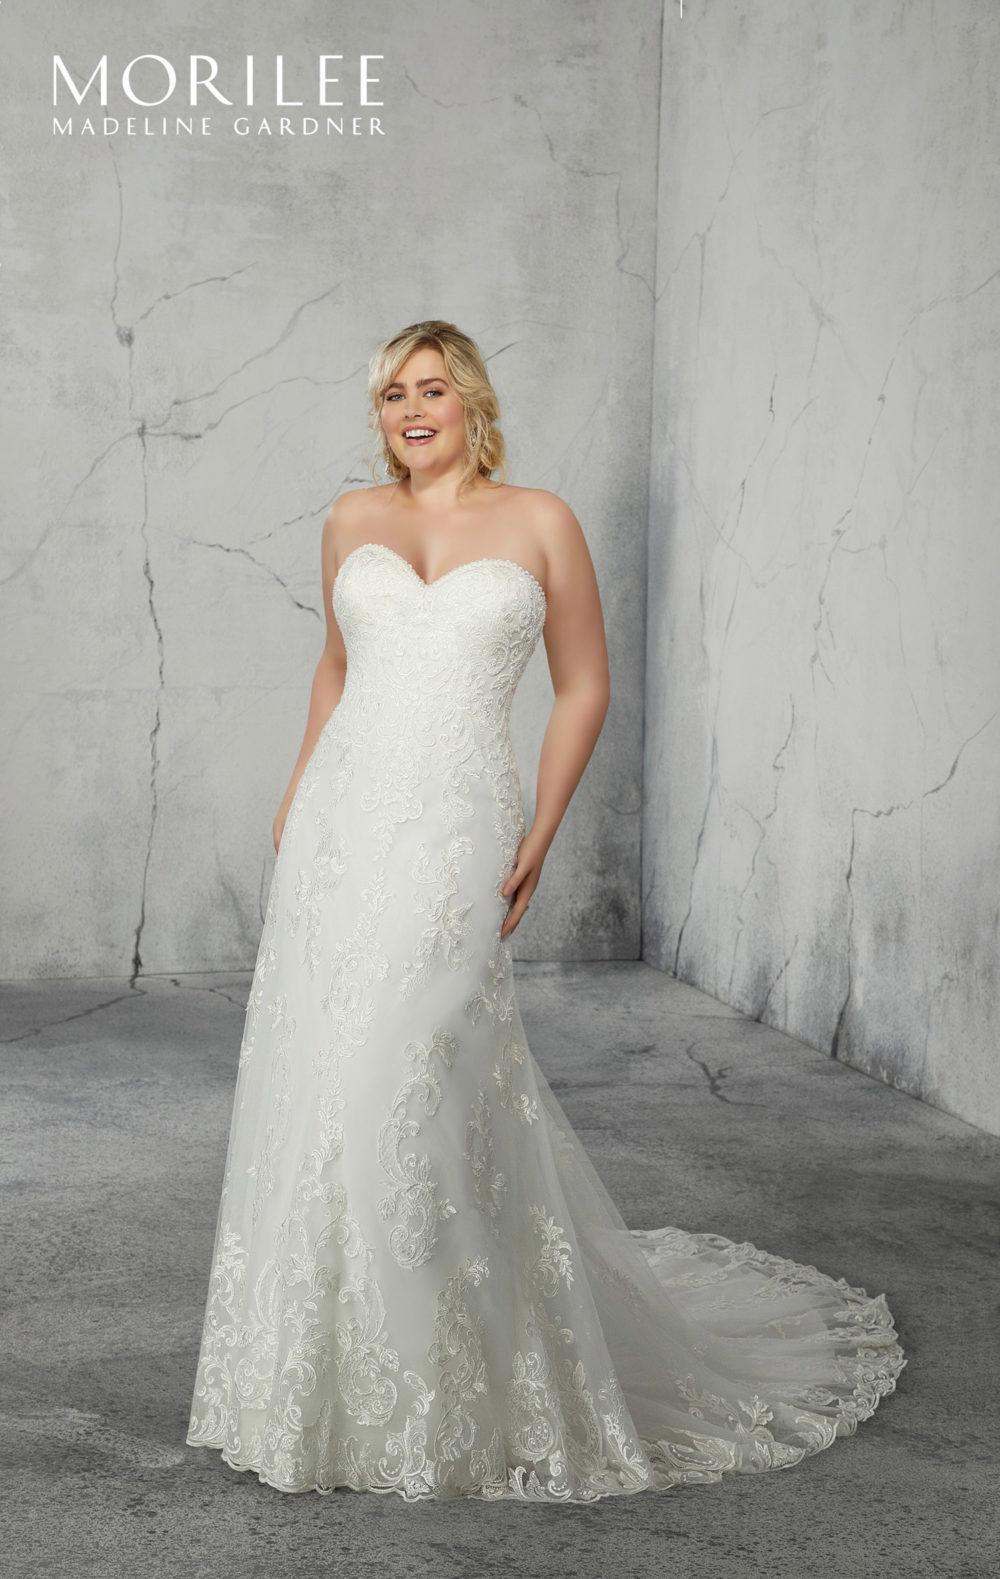 Mariages: abito da sposa Curvy 2020 a Vicenza, Verona, Padova, Veneto 3266